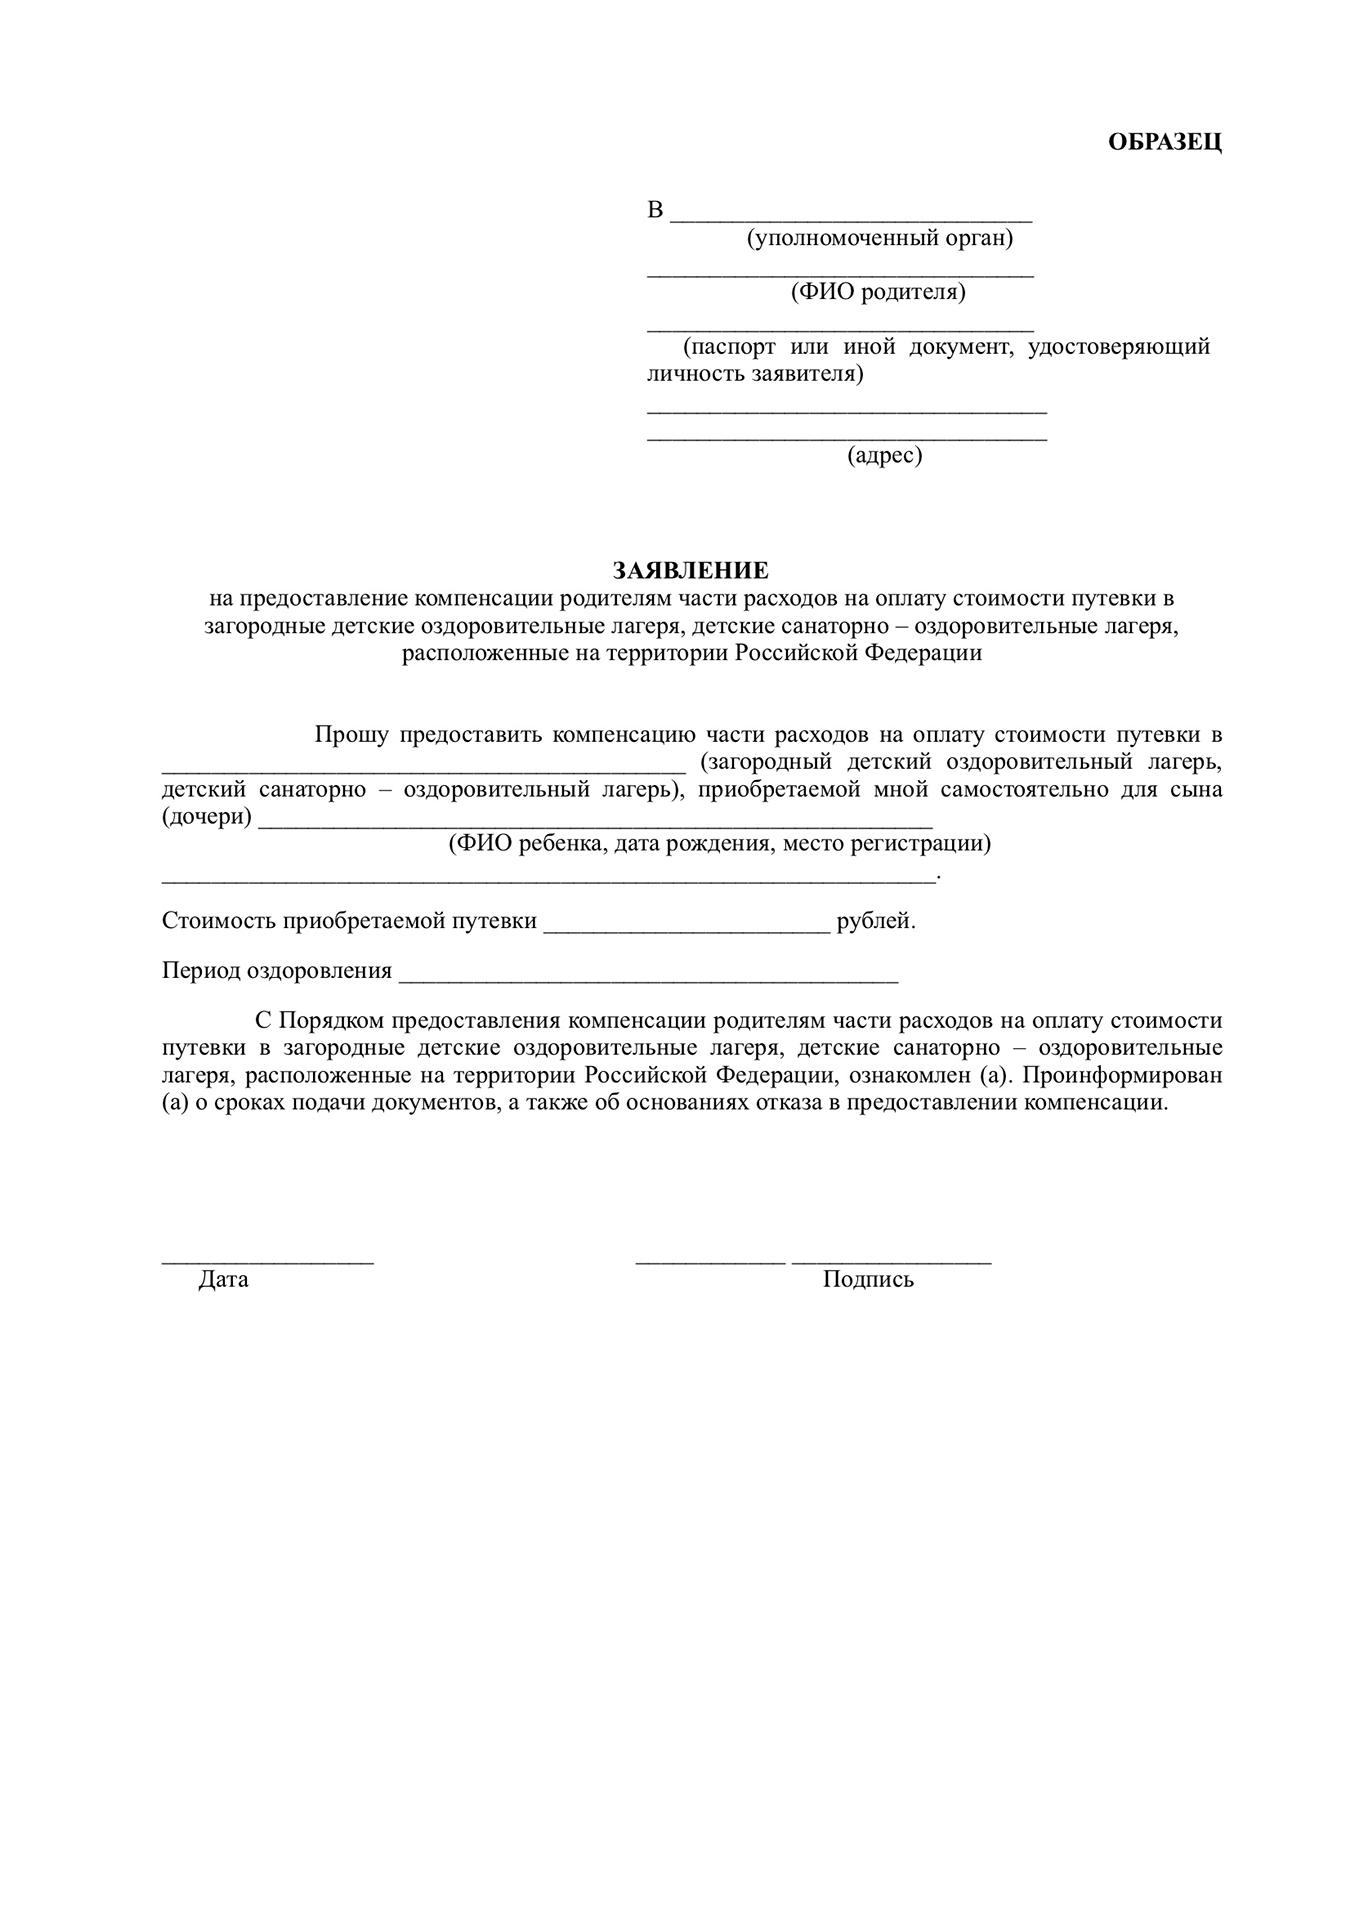 Отмена кассового символа по валюте